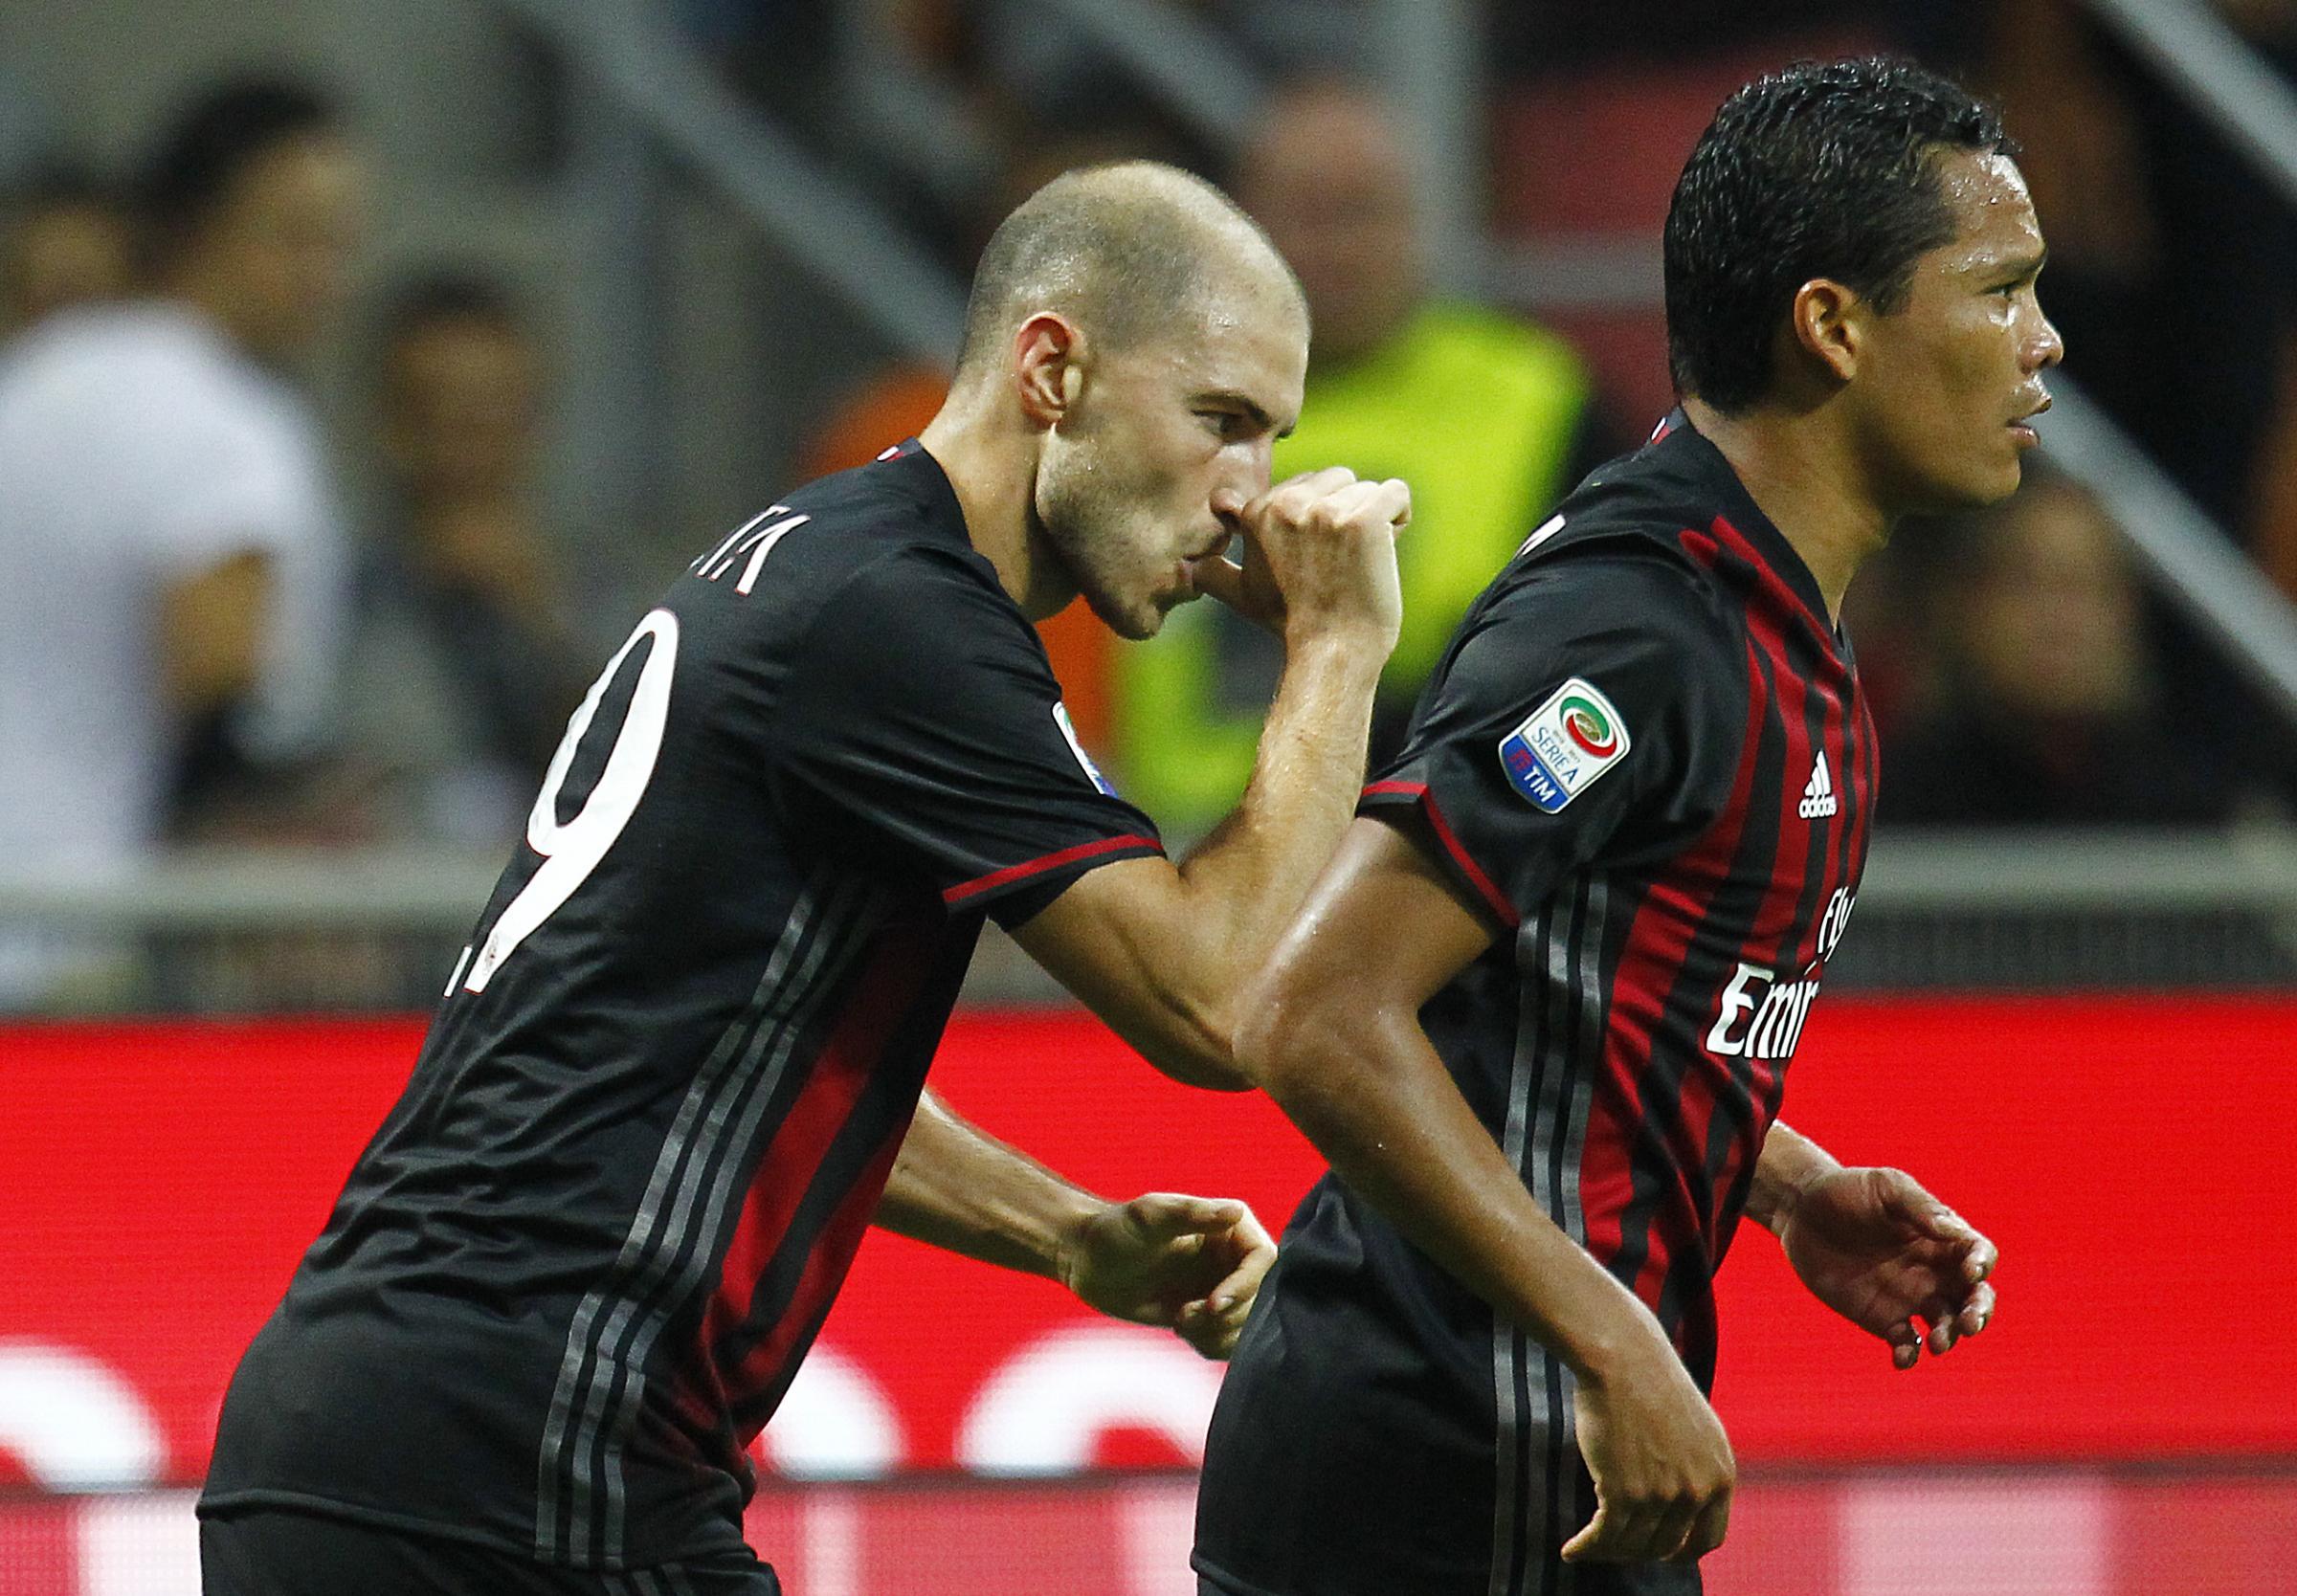 Milan. partita incredibile | Foto - Sportmediaset